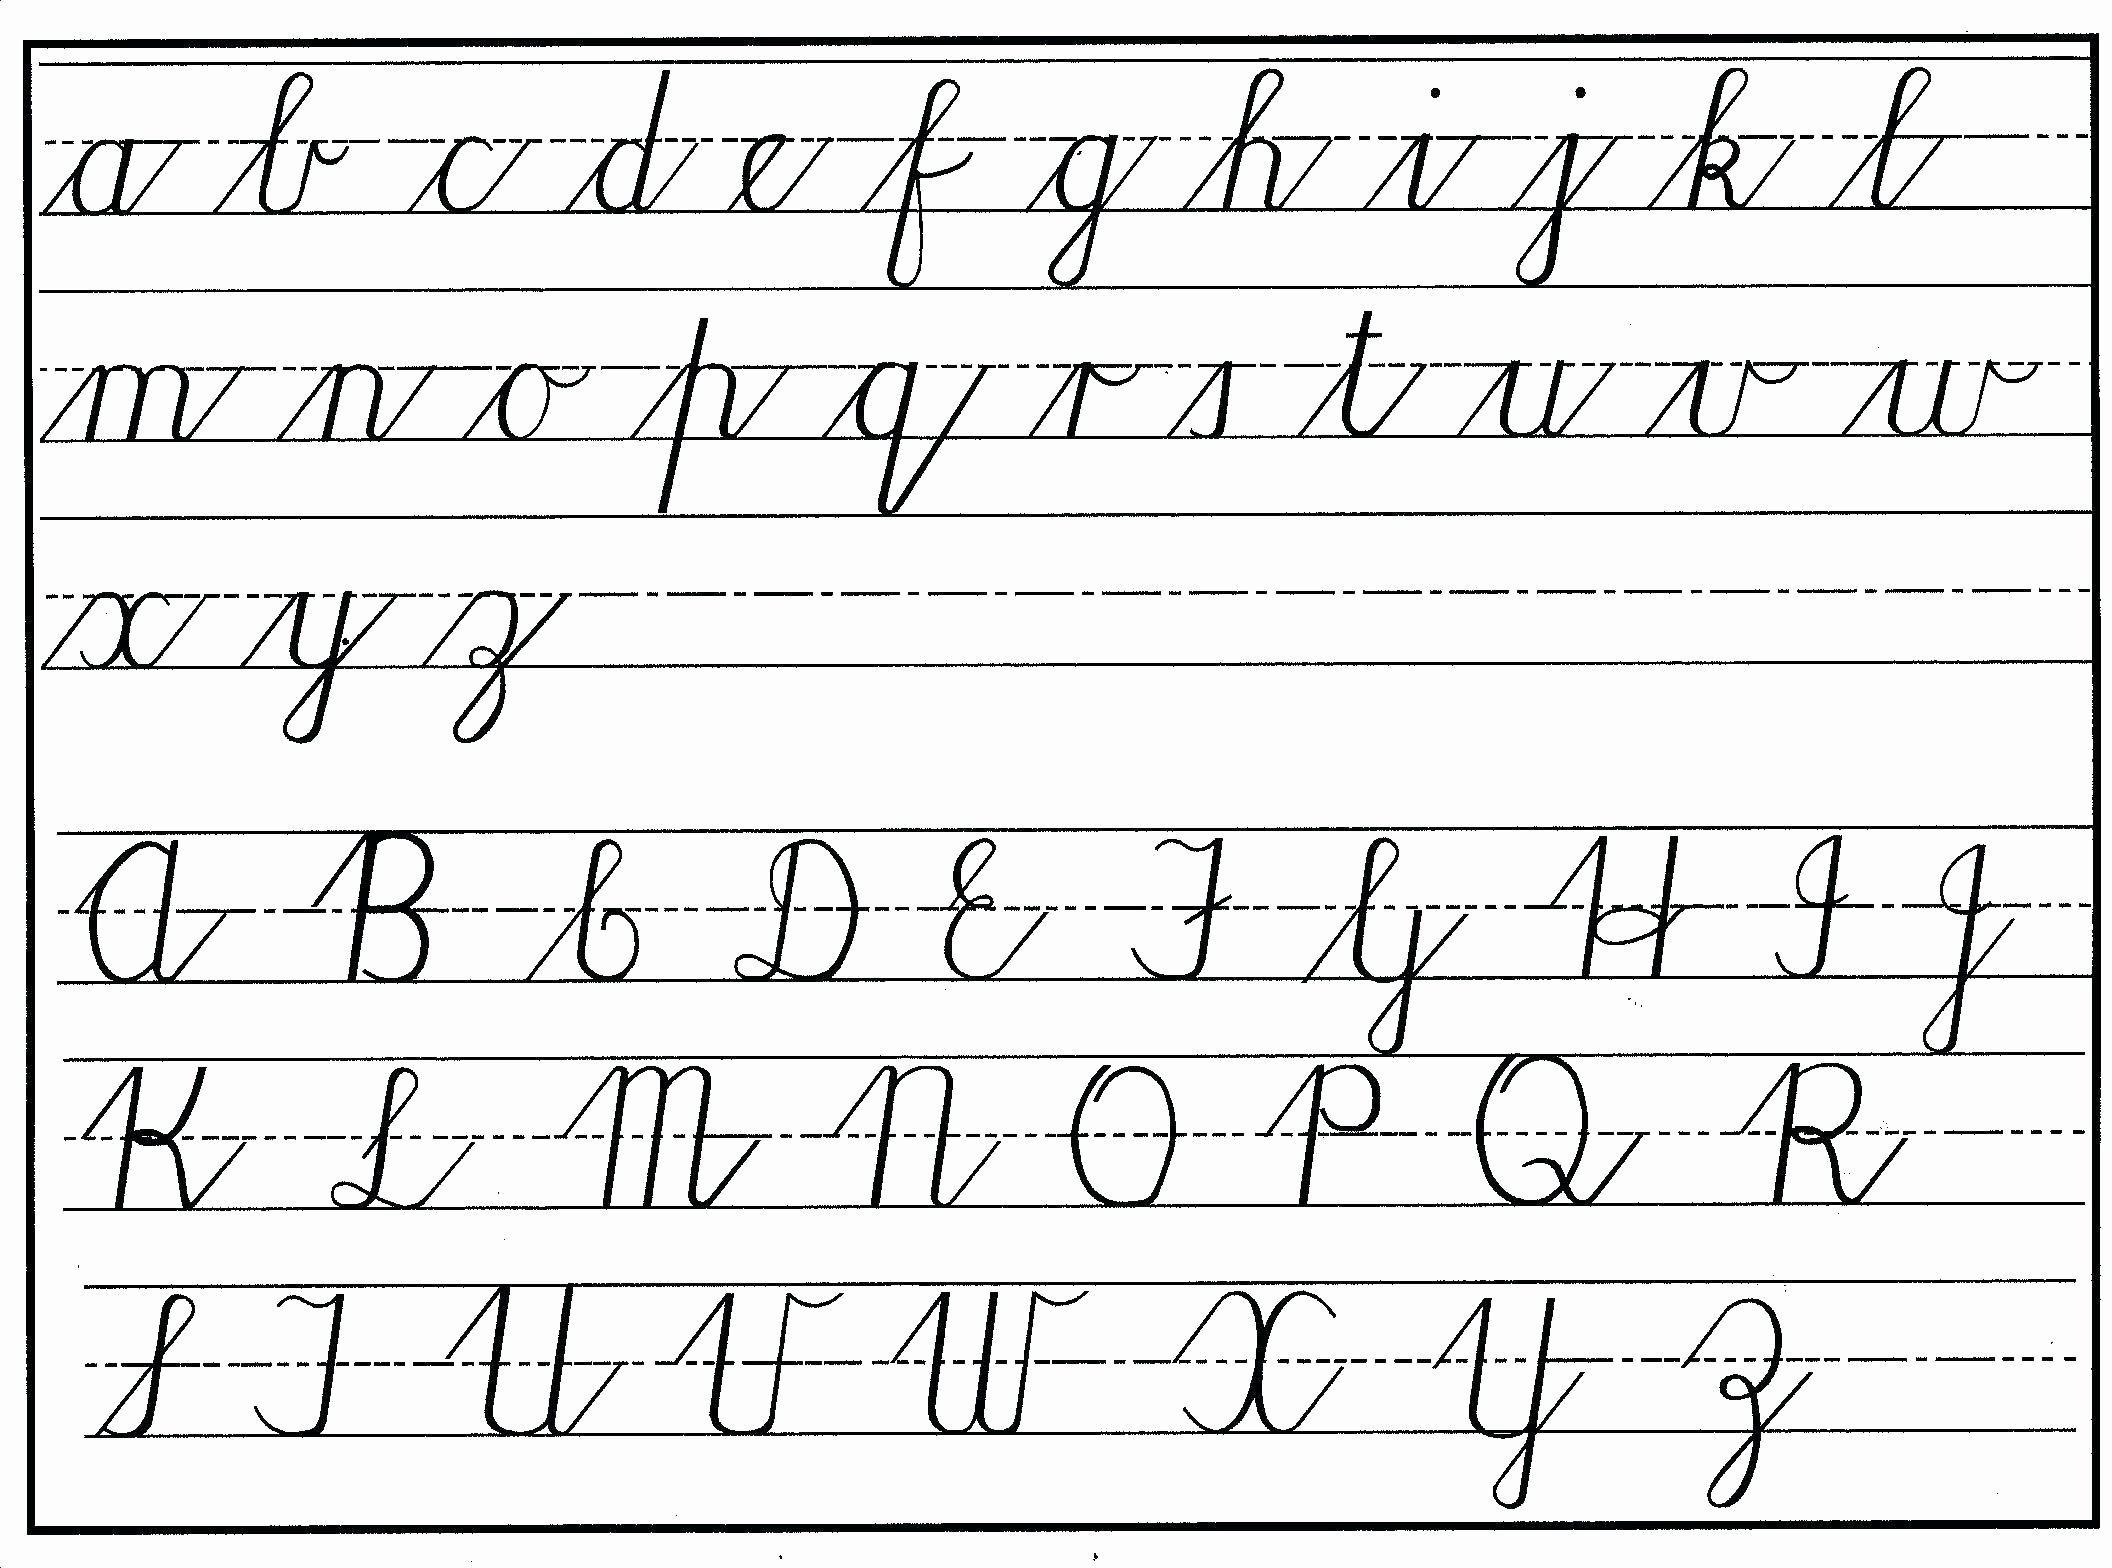 Alphabet Coloring Worksheets A-Z Pdf Inspirational Alphabet